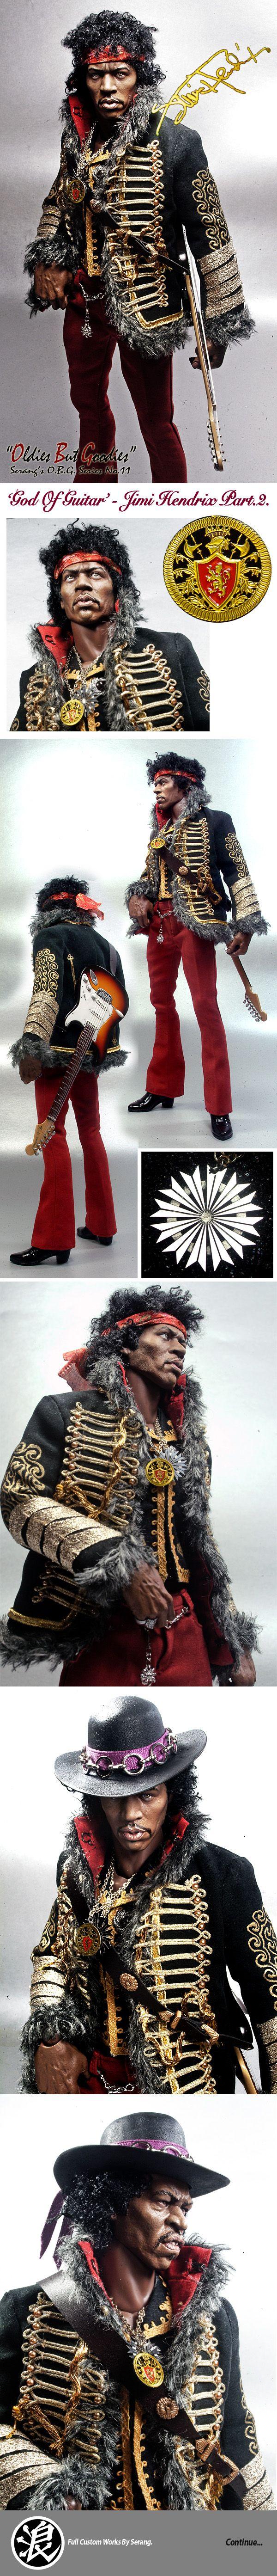 Kim Serang, Jimi Hendrix custom 1/6 figure... Insane work!